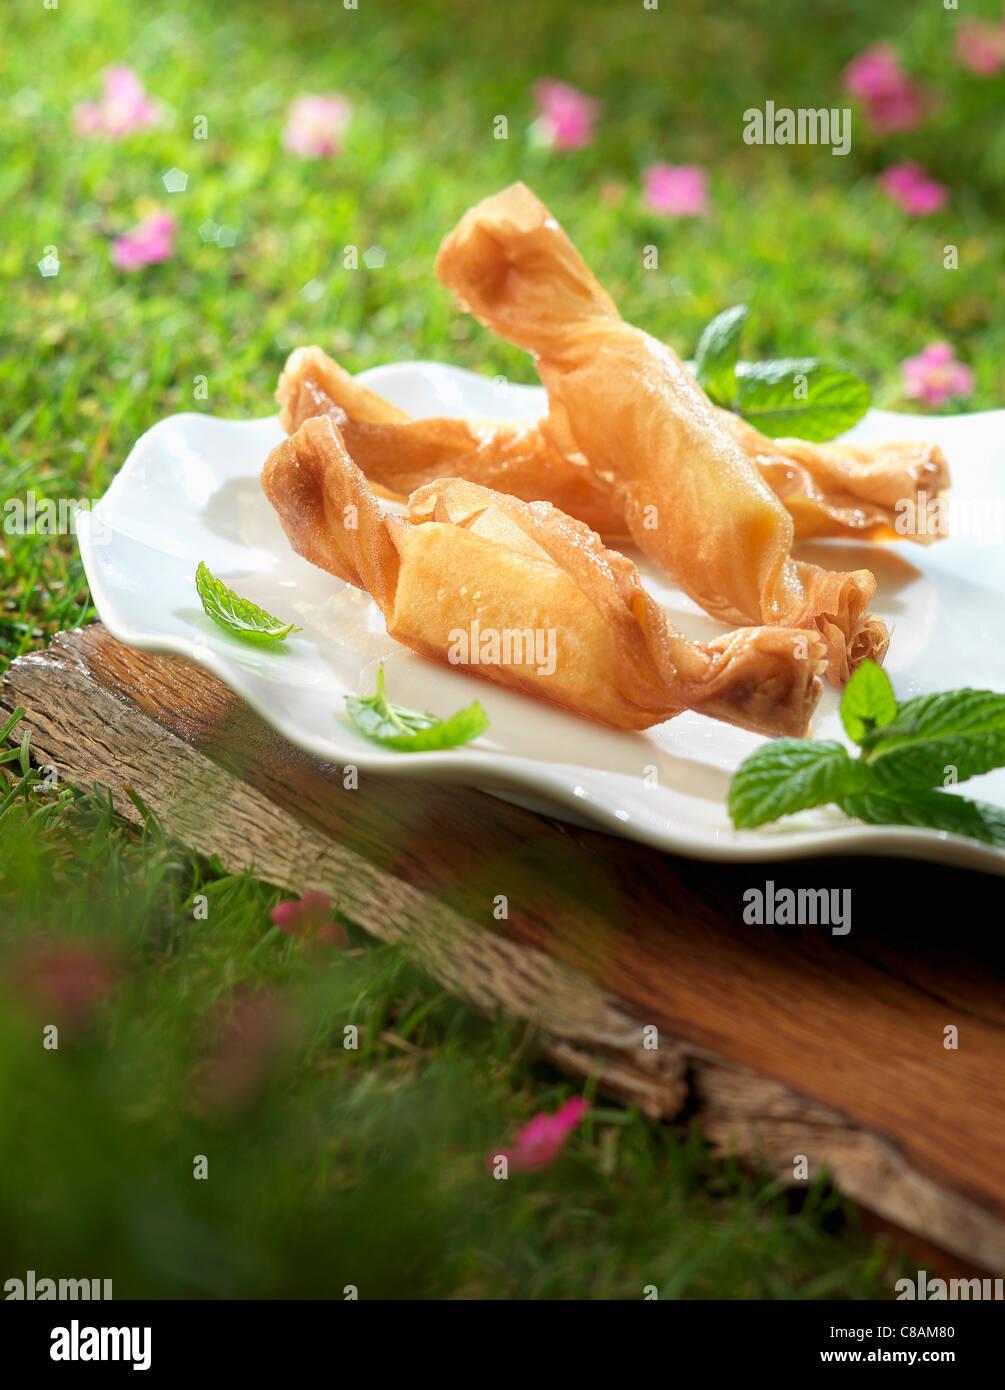 Crisp cheese candies - Stock Image